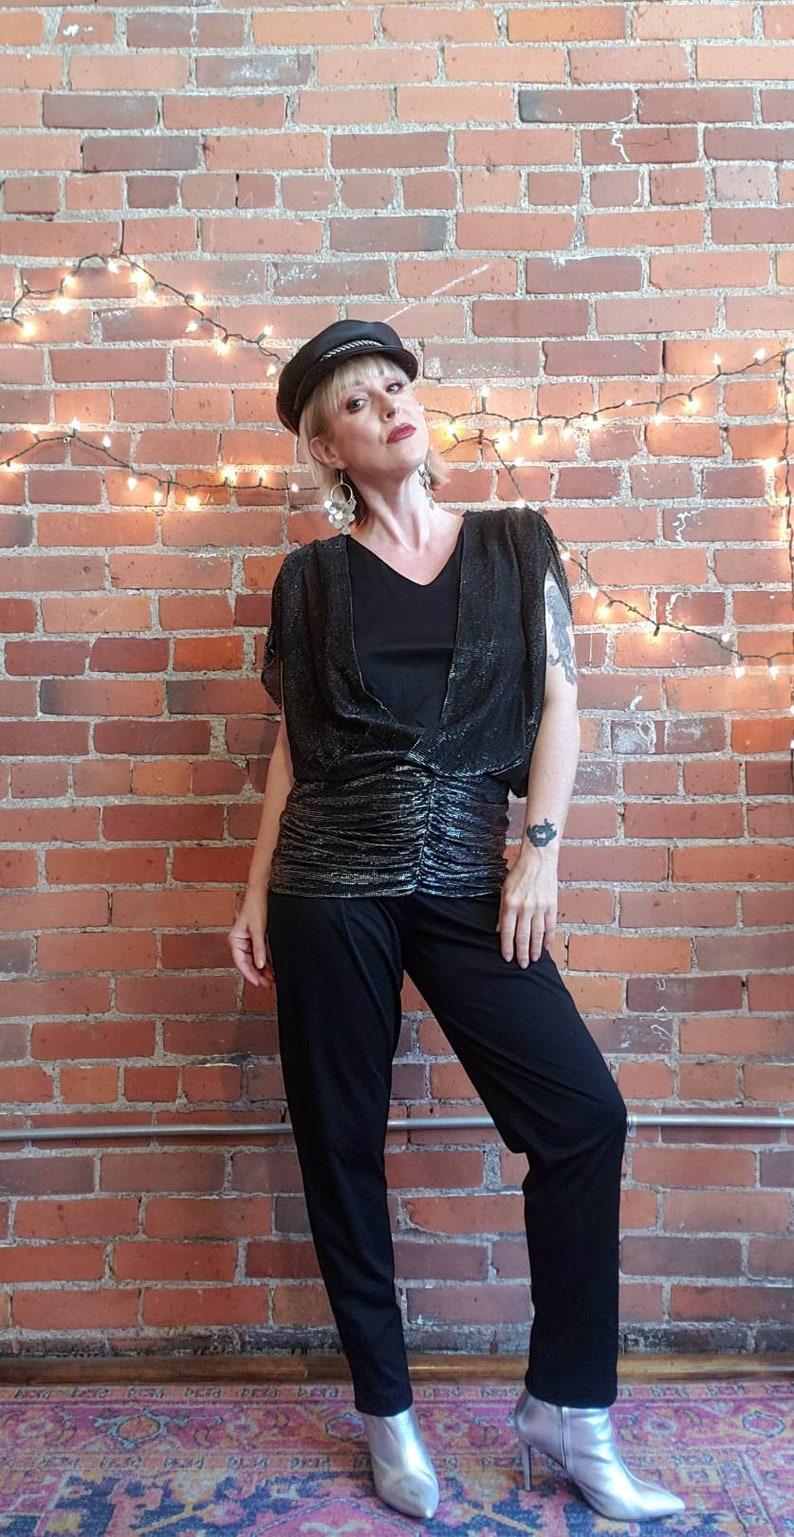 vintage 70s 80s black jumpsuit silver lurex metallic rushed bold shoulders disco new wave